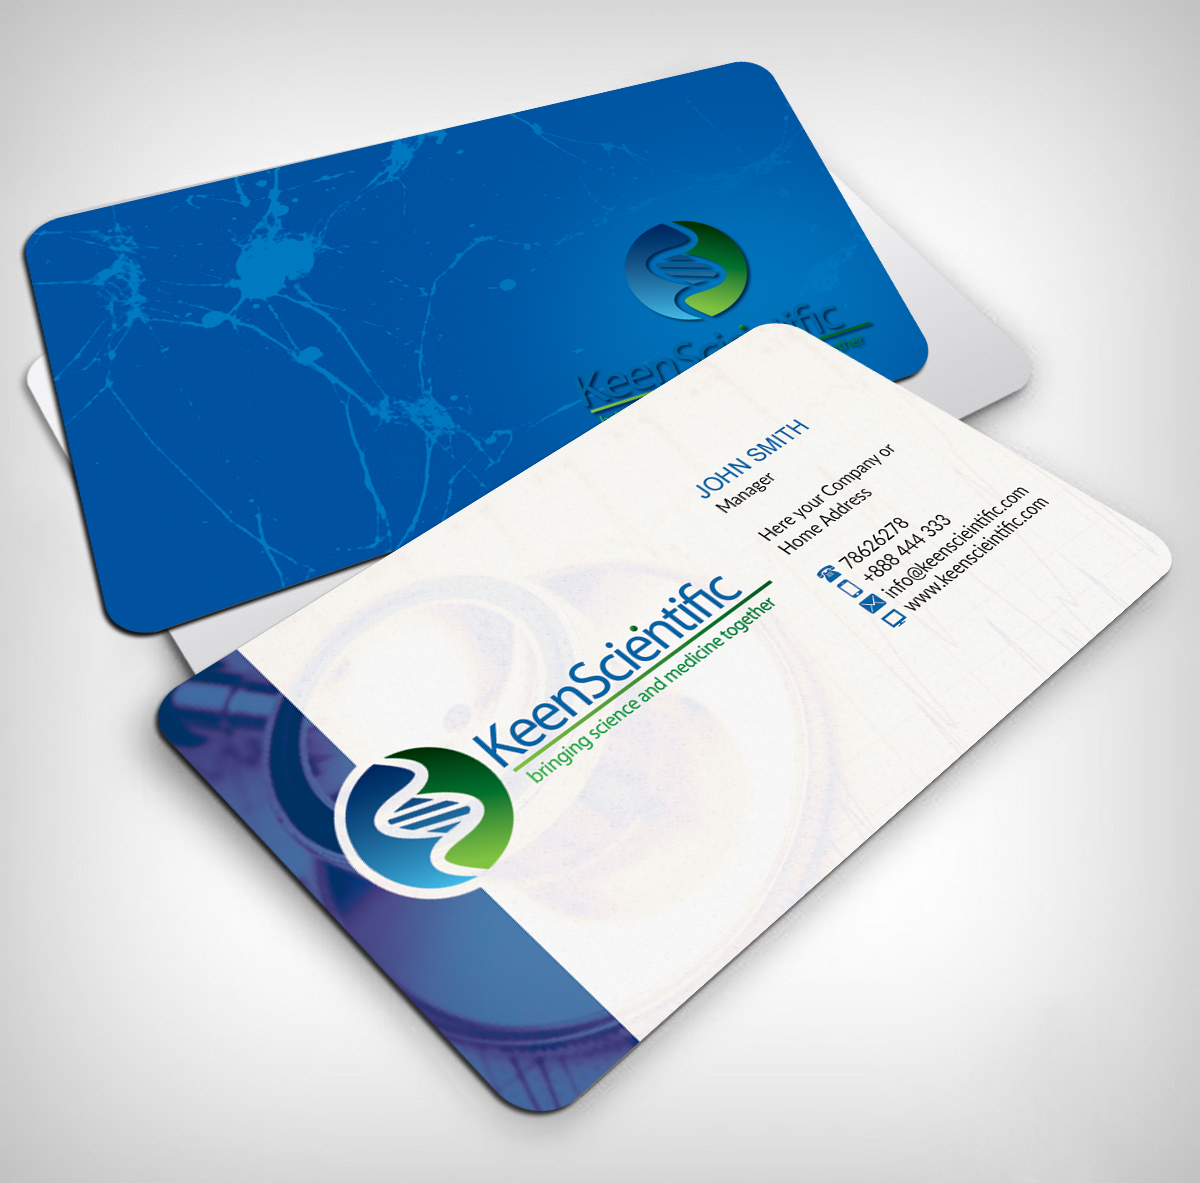 Business Card Design By Nuhanenterprise For Andra Blomkalns | Design  #3831656